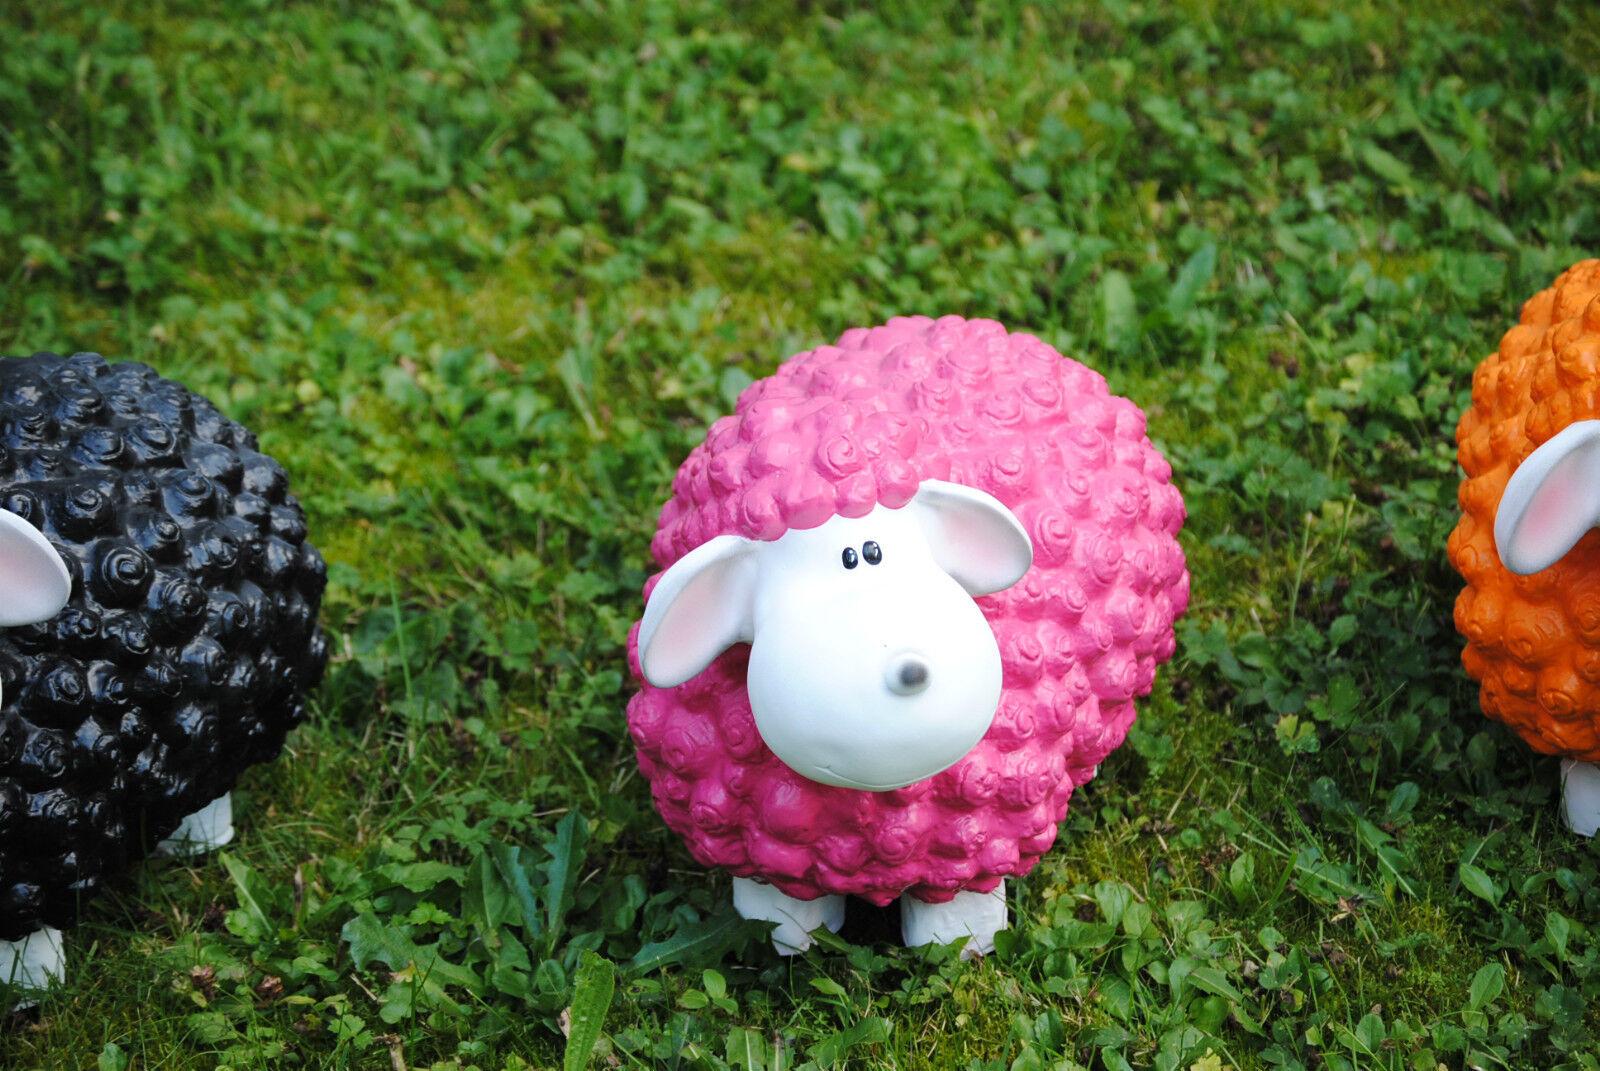 lustiges deko schaf bunt lamm rosa pinktierfigur. Black Bedroom Furniture Sets. Home Design Ideas